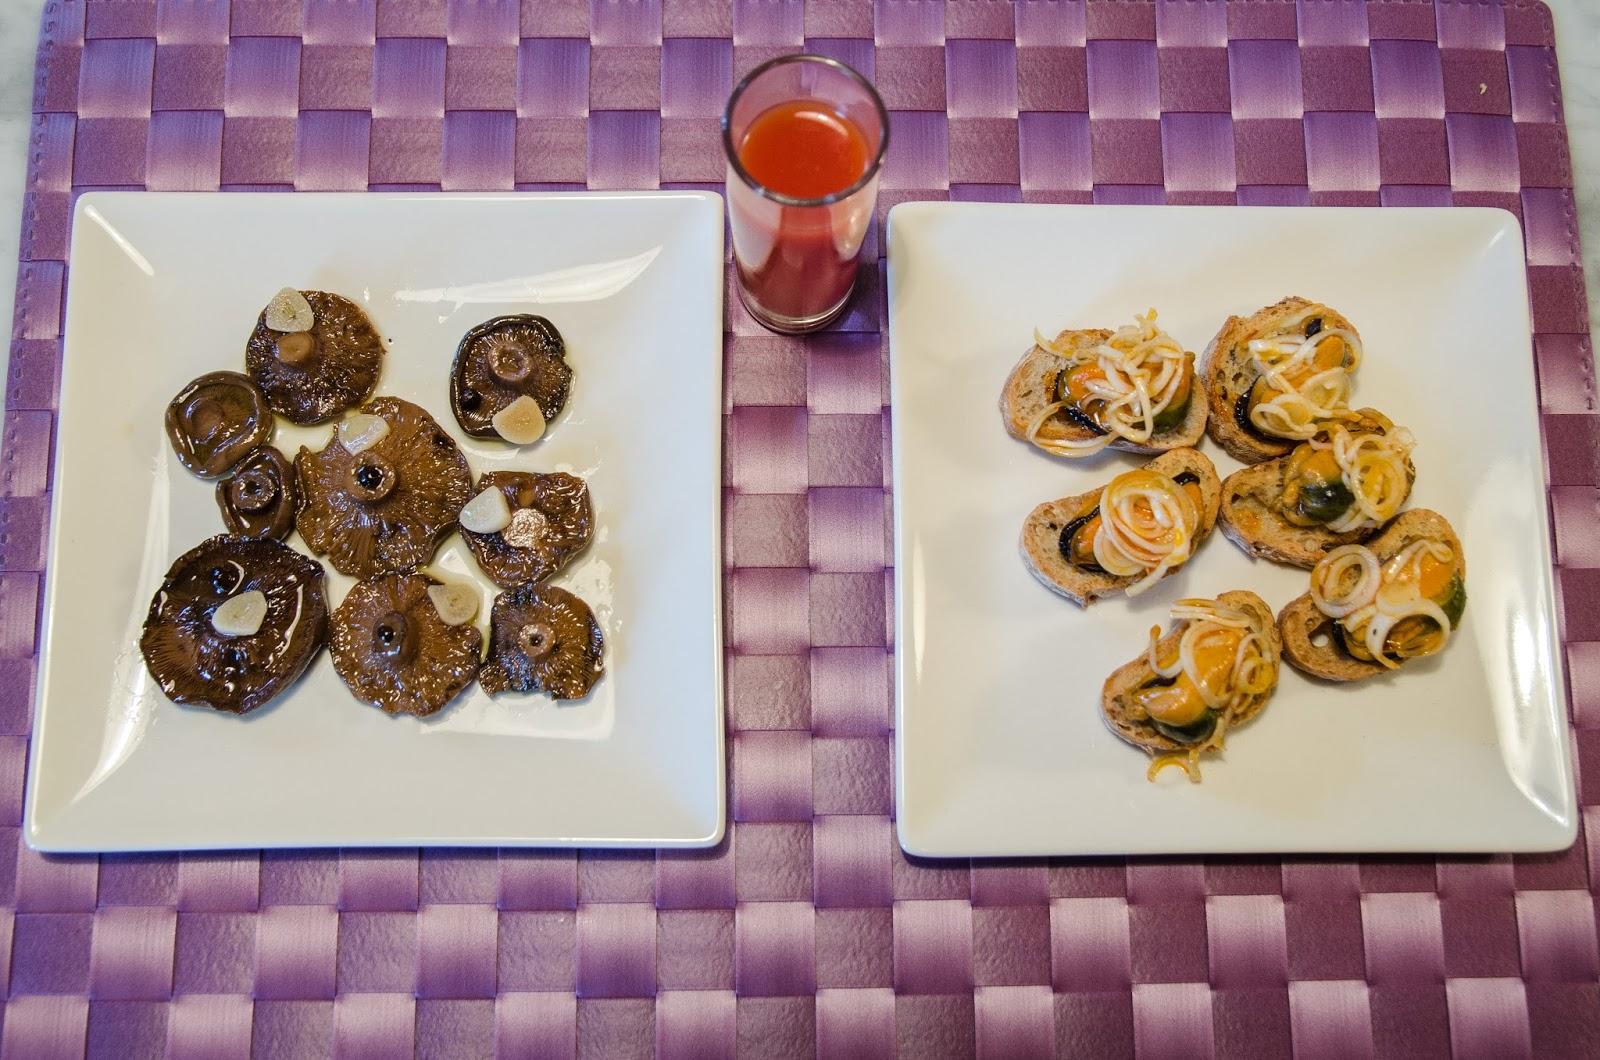 aperitivo-bloody mary-rovellons-mejillones-recetas-bruja